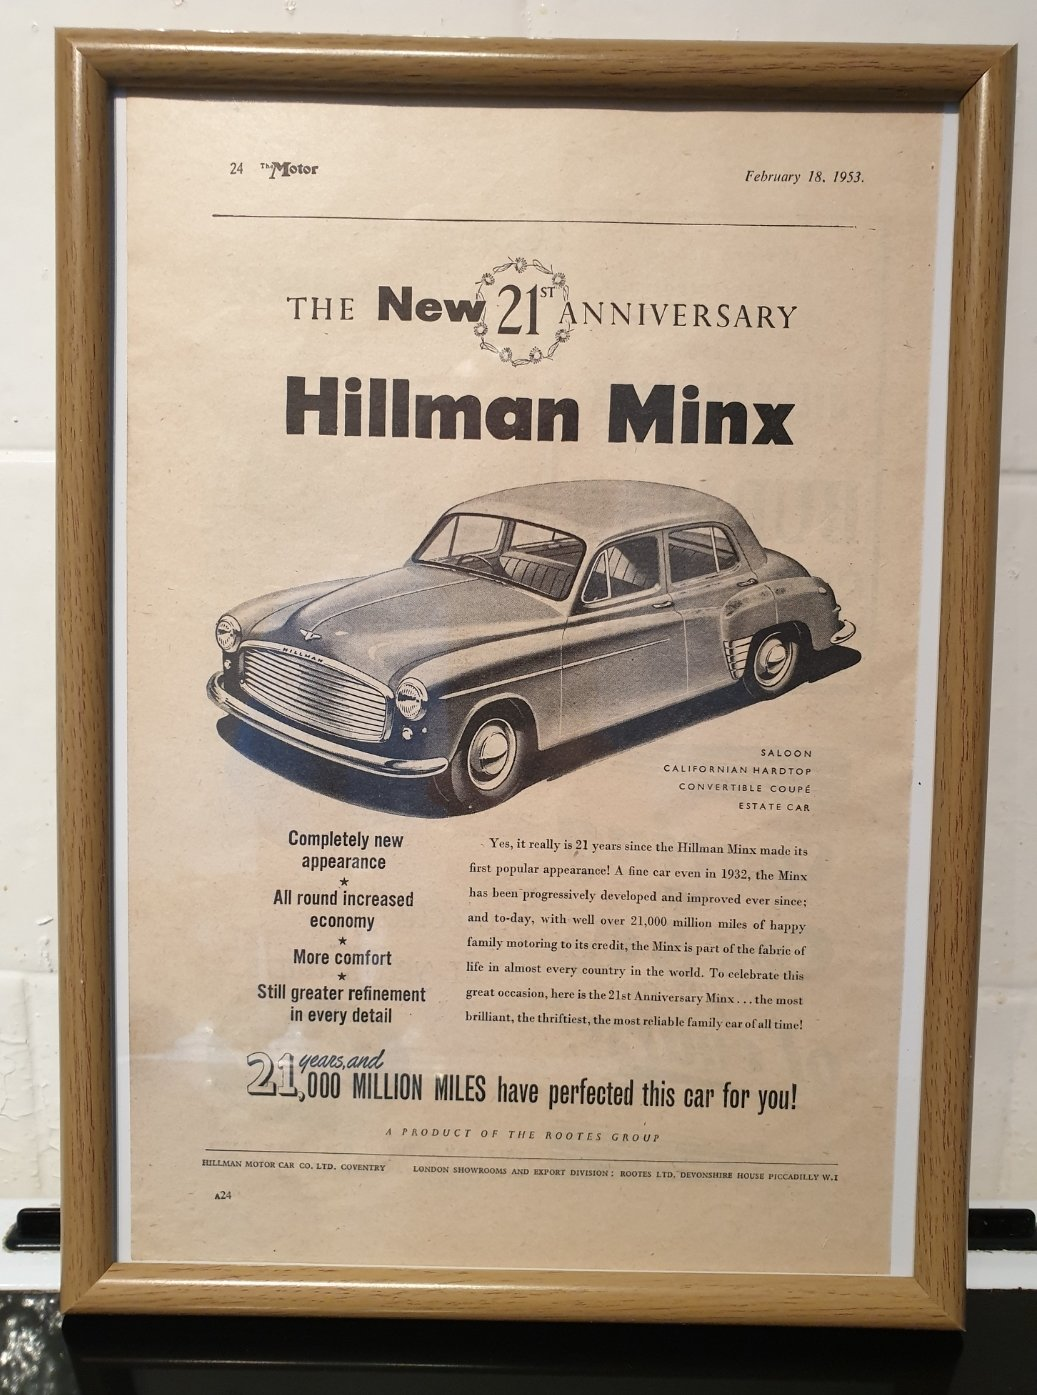 1953 Hillman Minx Framed Advert Original  For Sale (picture 1 of 2)